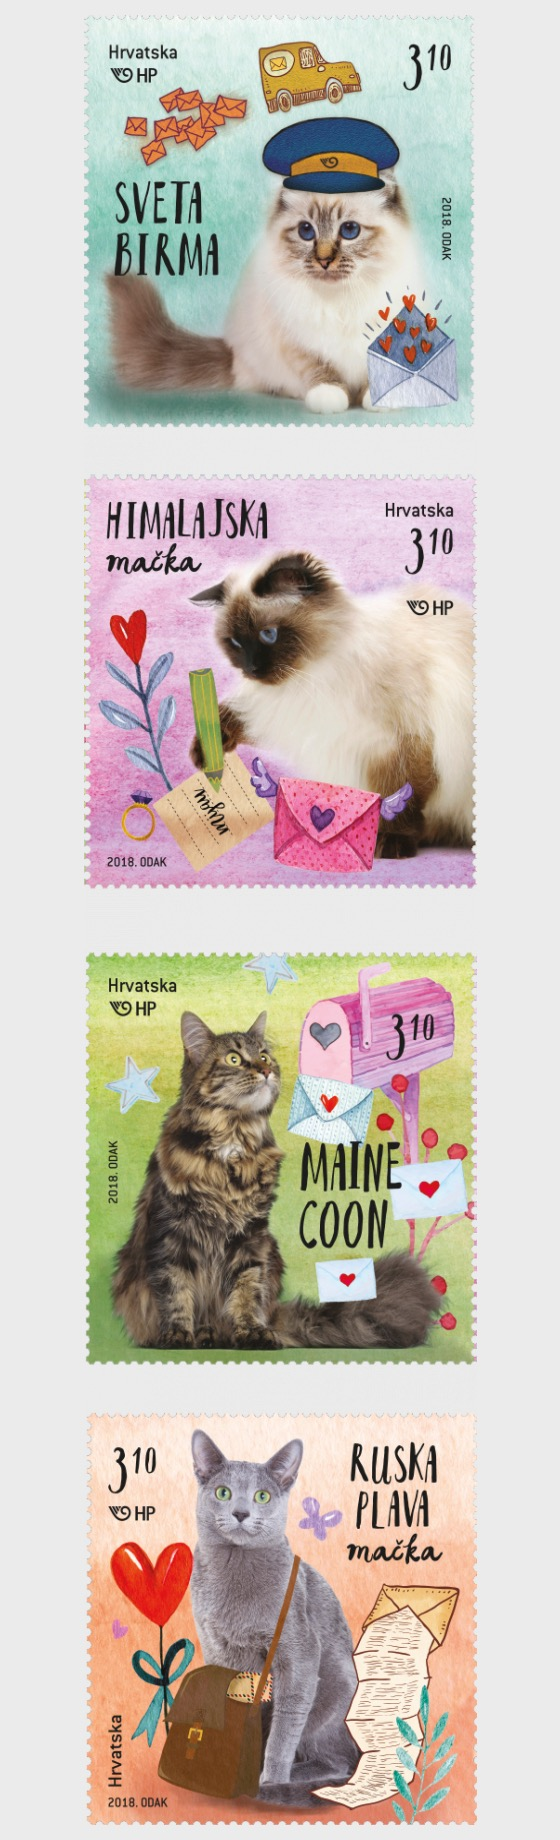 Children's World - Pets - Cats II - Set